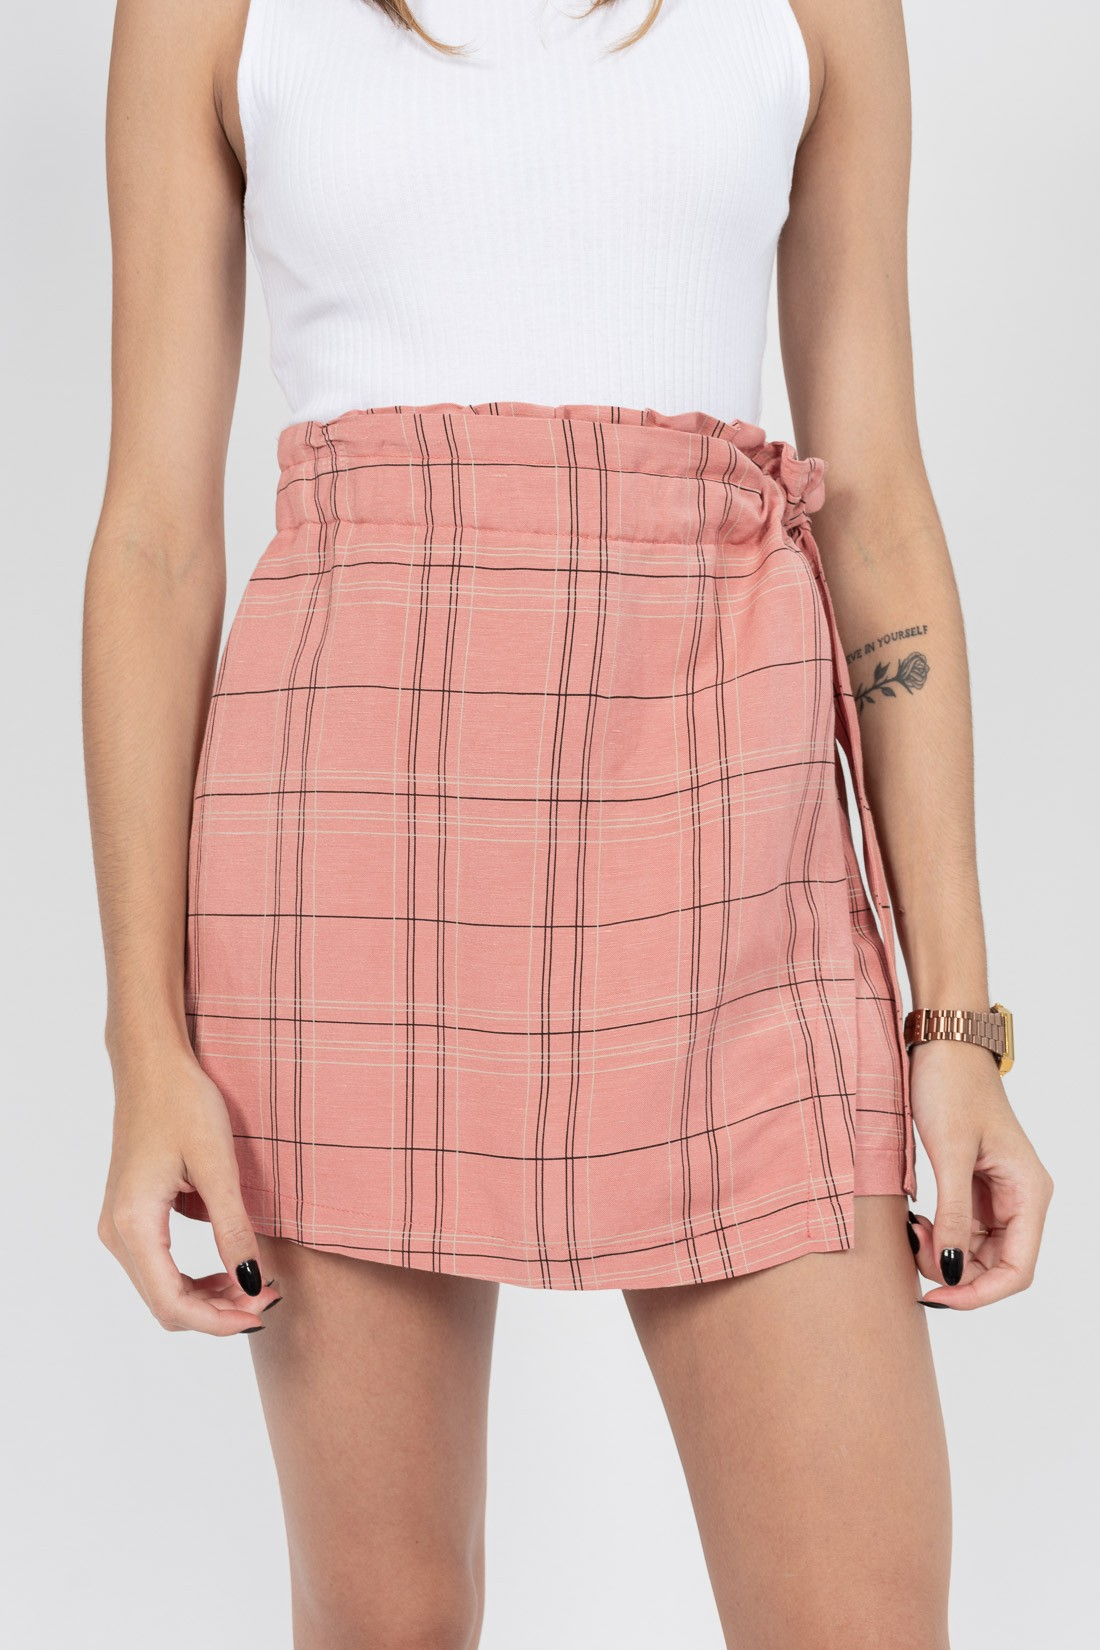 Shorts Saia Colcci Xadrez